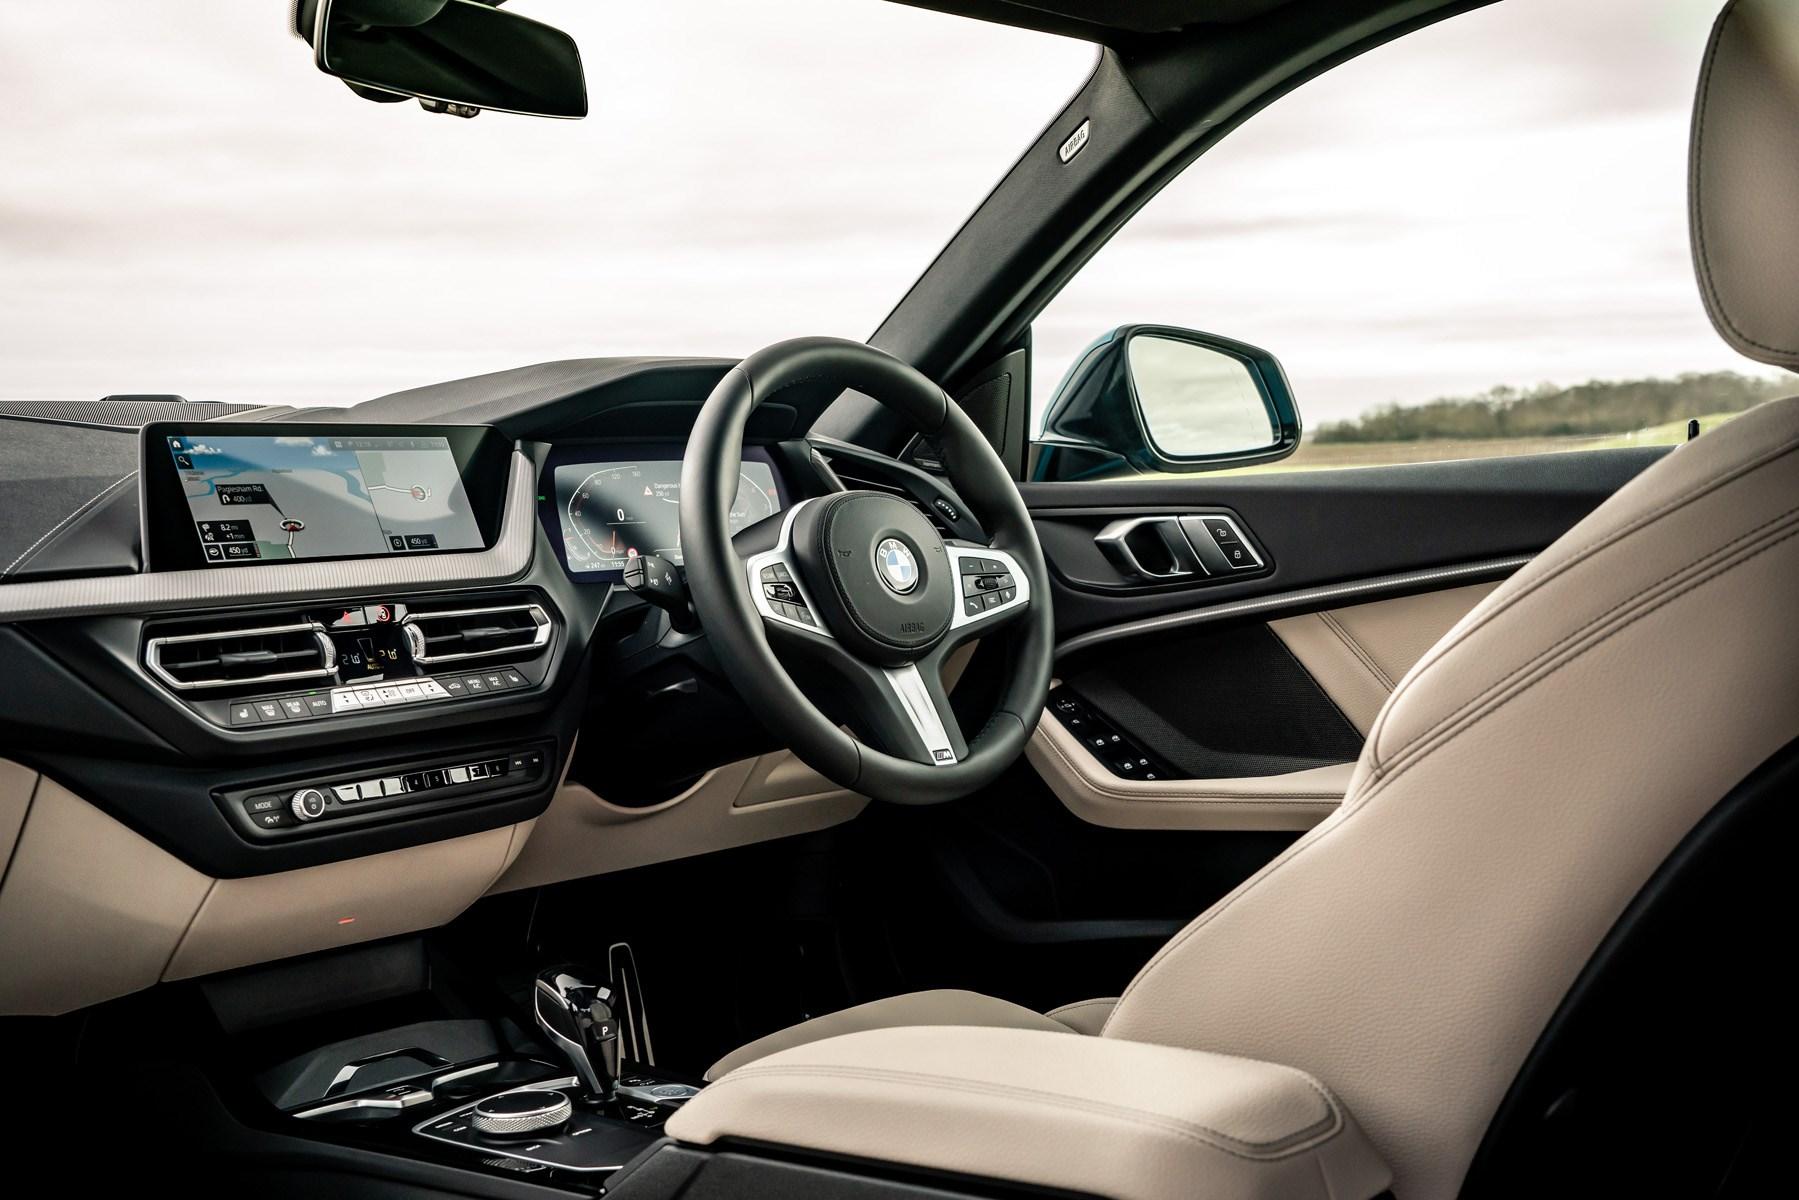 BMW 2-series Gran Coupe 218i interior